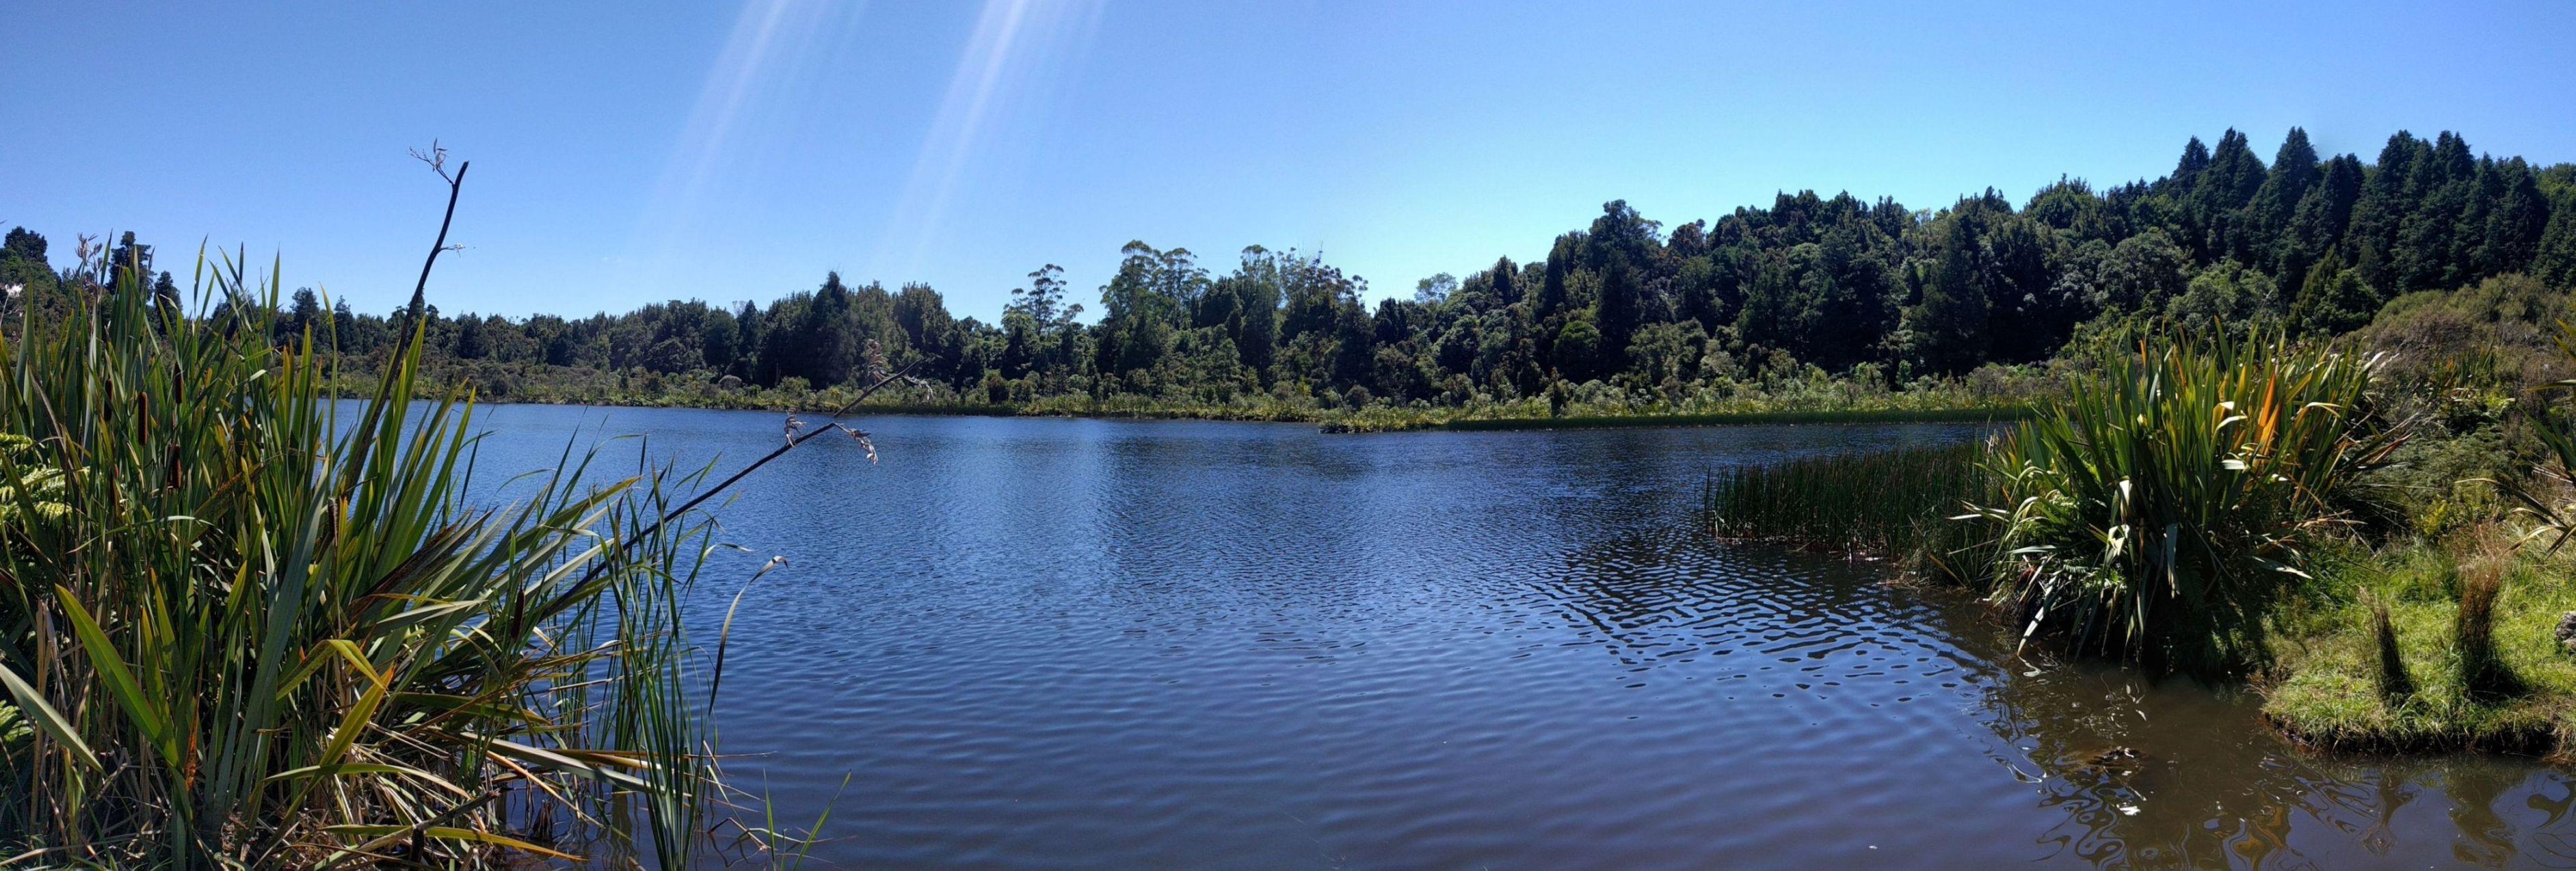 Jazero pri Okahune